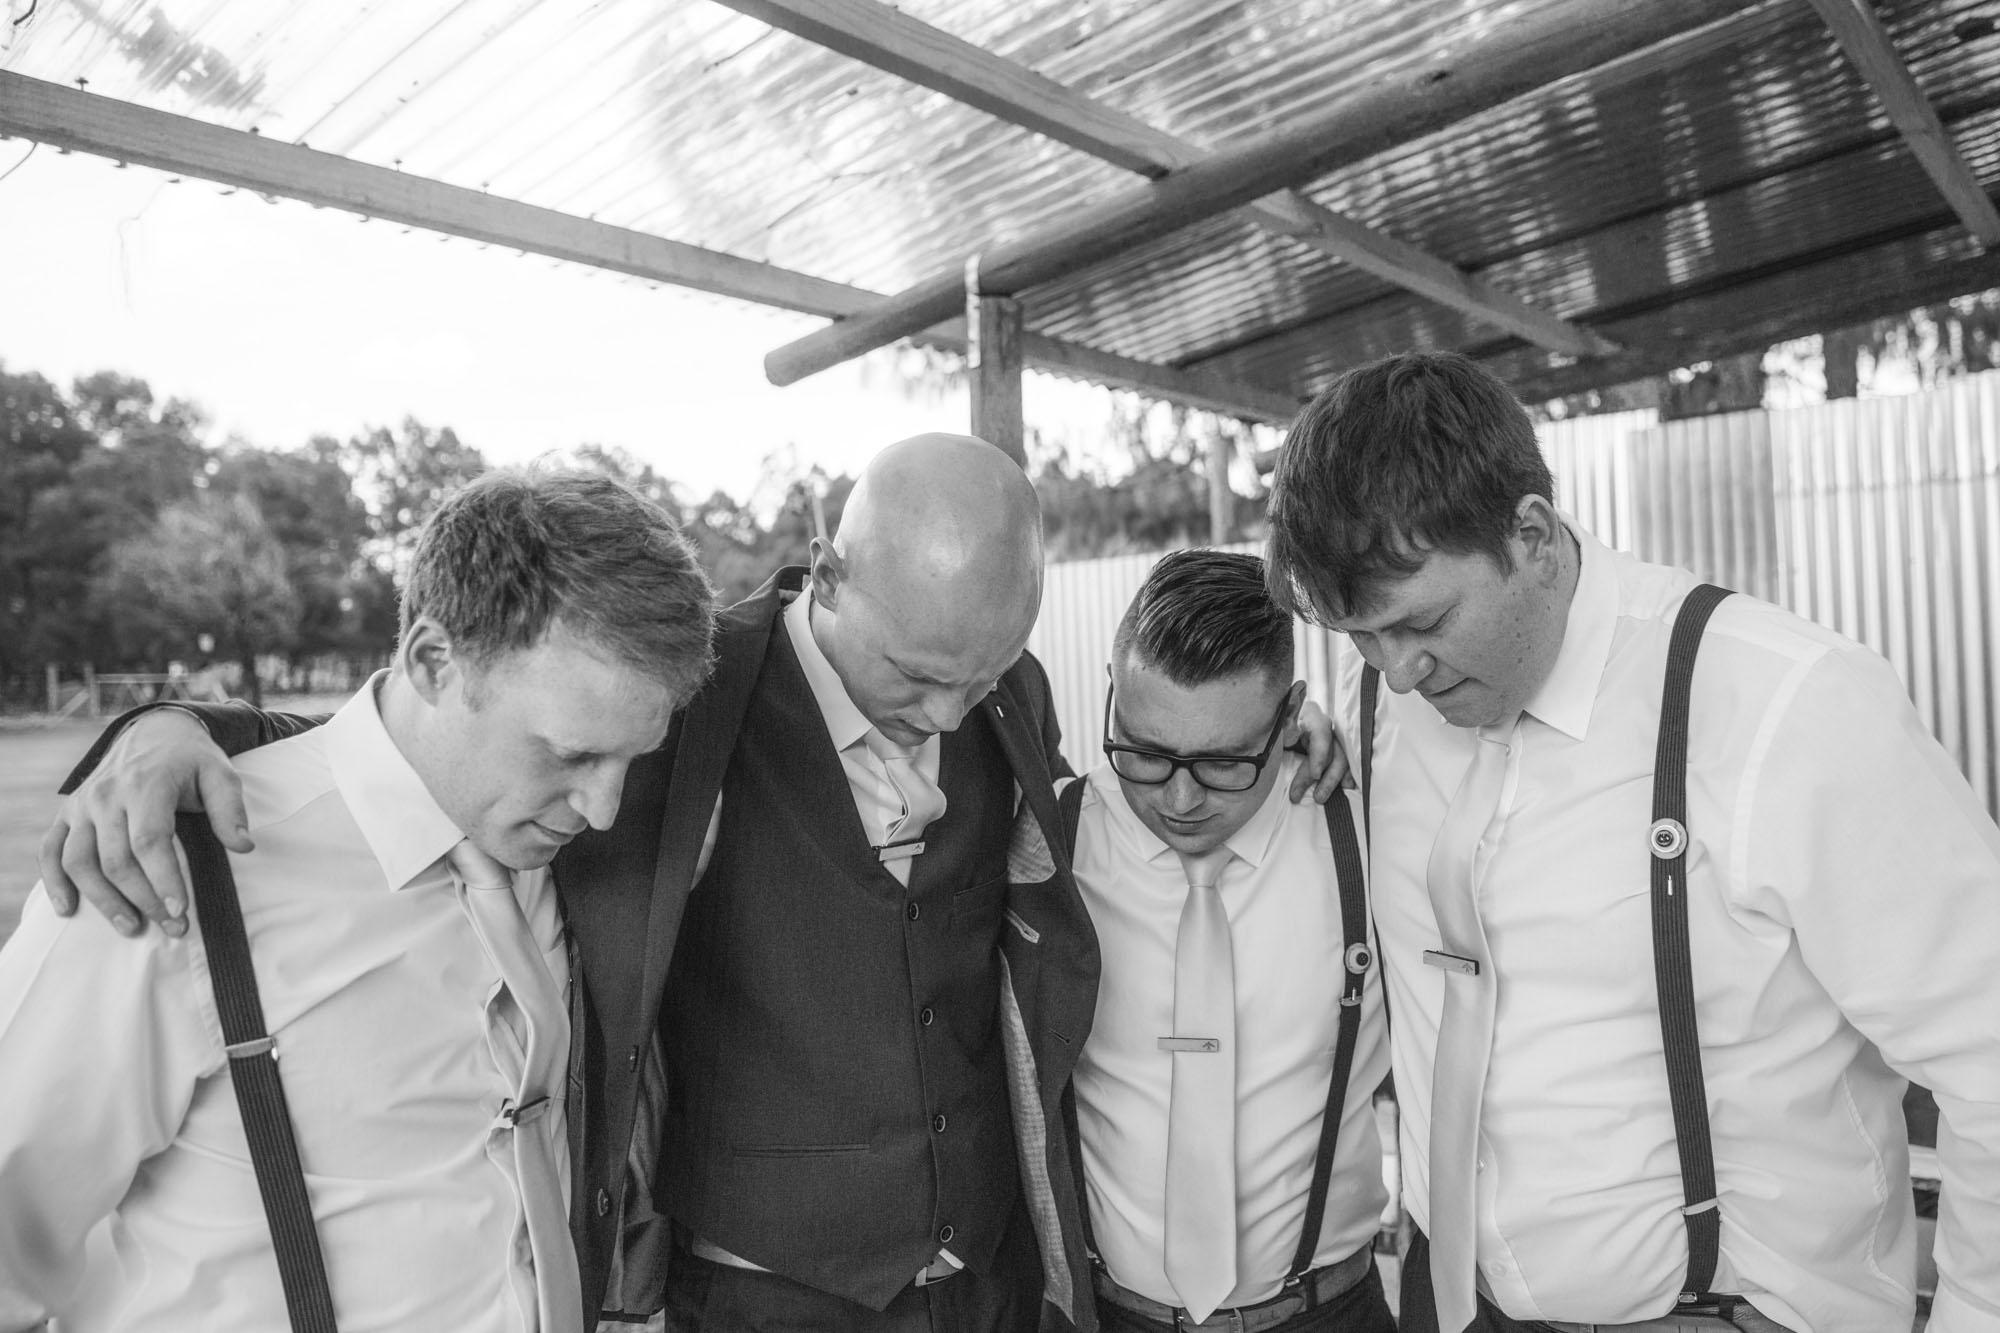 044-best-wedding-photographers-johannesburg044-best-wedding-photographers-johannesburg_a.jpg